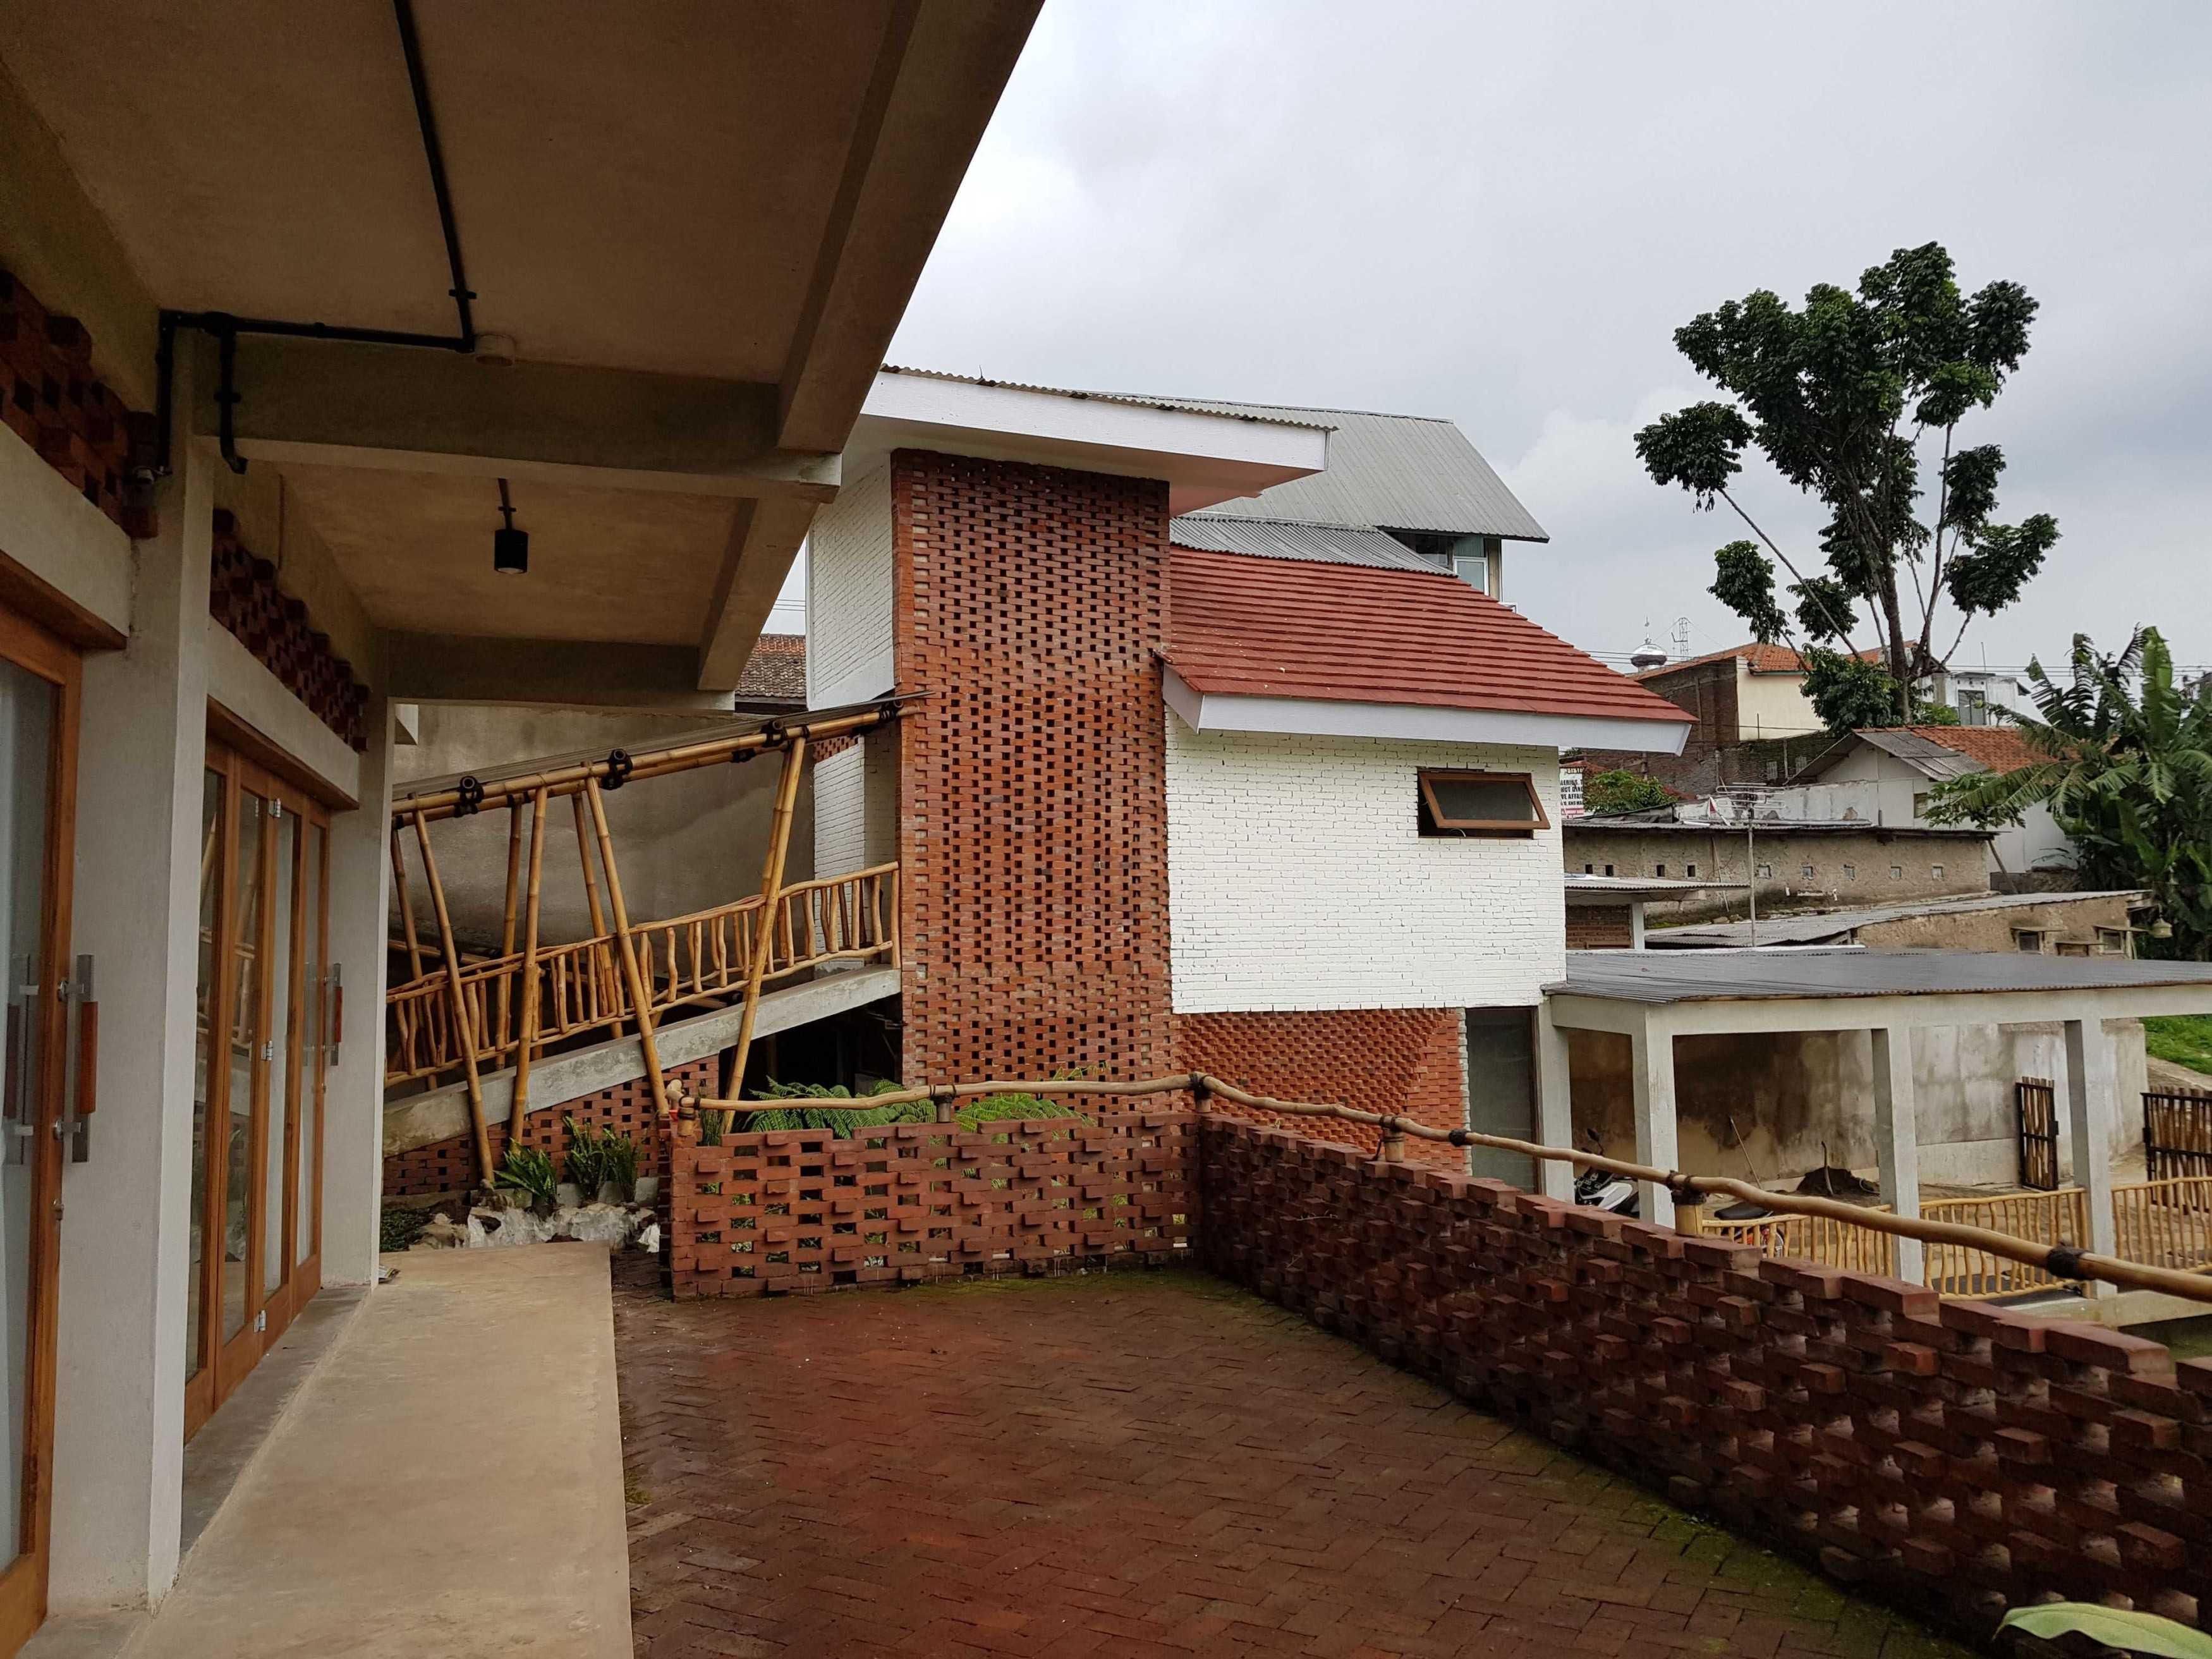 Junge Architekt Studio Imah Bata Villa, Bandung Indonesia Sindanglaya, Cimenyan, Bandung, Jawa Barat, Indonesia Sindanglaya, Cimenyan, Bandung, Jawa Barat, Indonesia Junge-Architekt-Studio-Imah-Bata-Villa-Bandung-Indonesia   67746